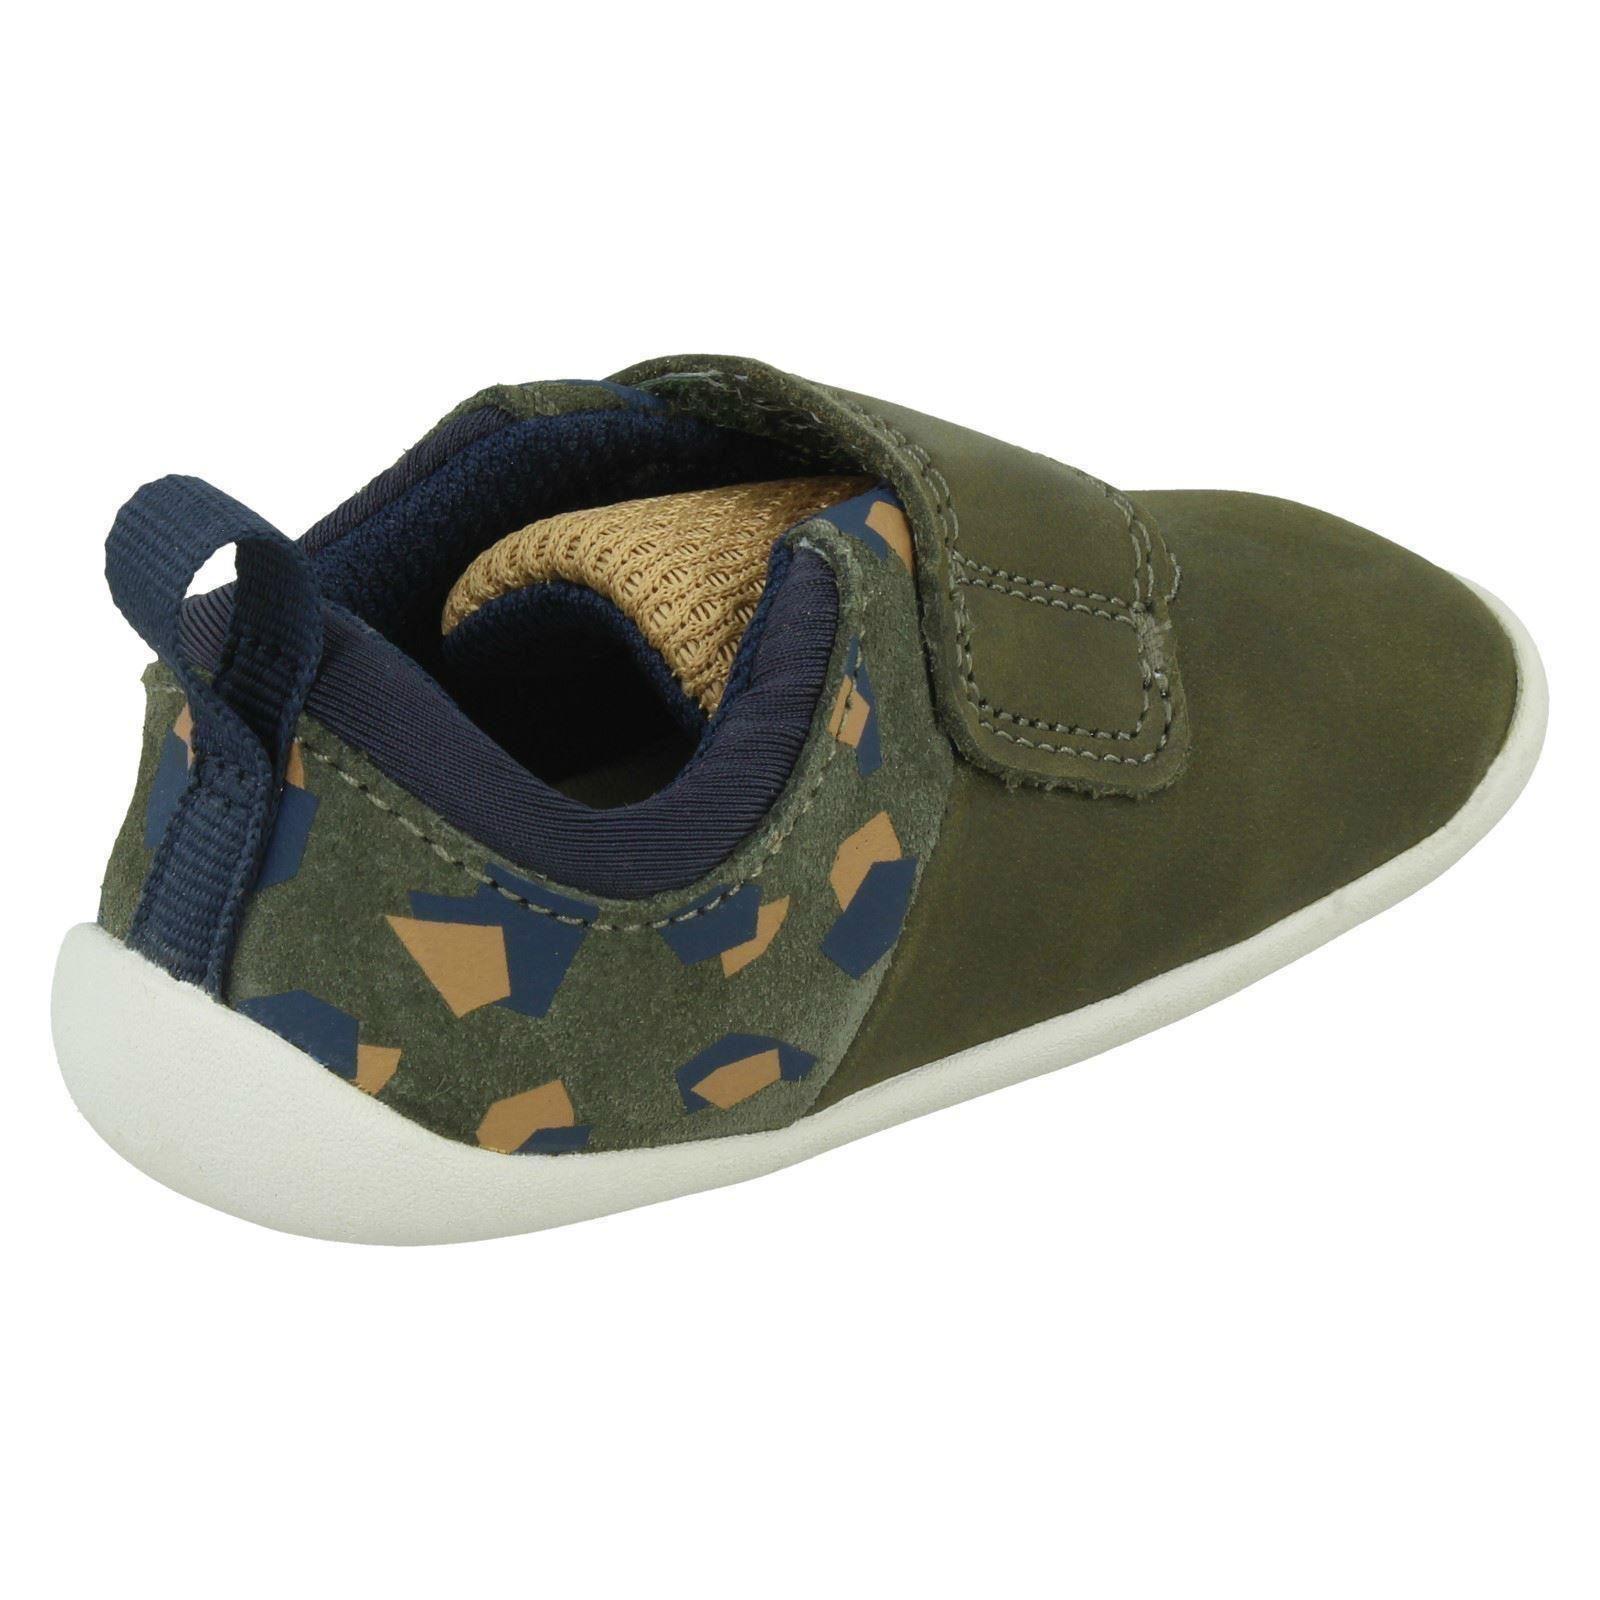 Childrens Clarks Hook /& Loop Shoes Roamer Sport